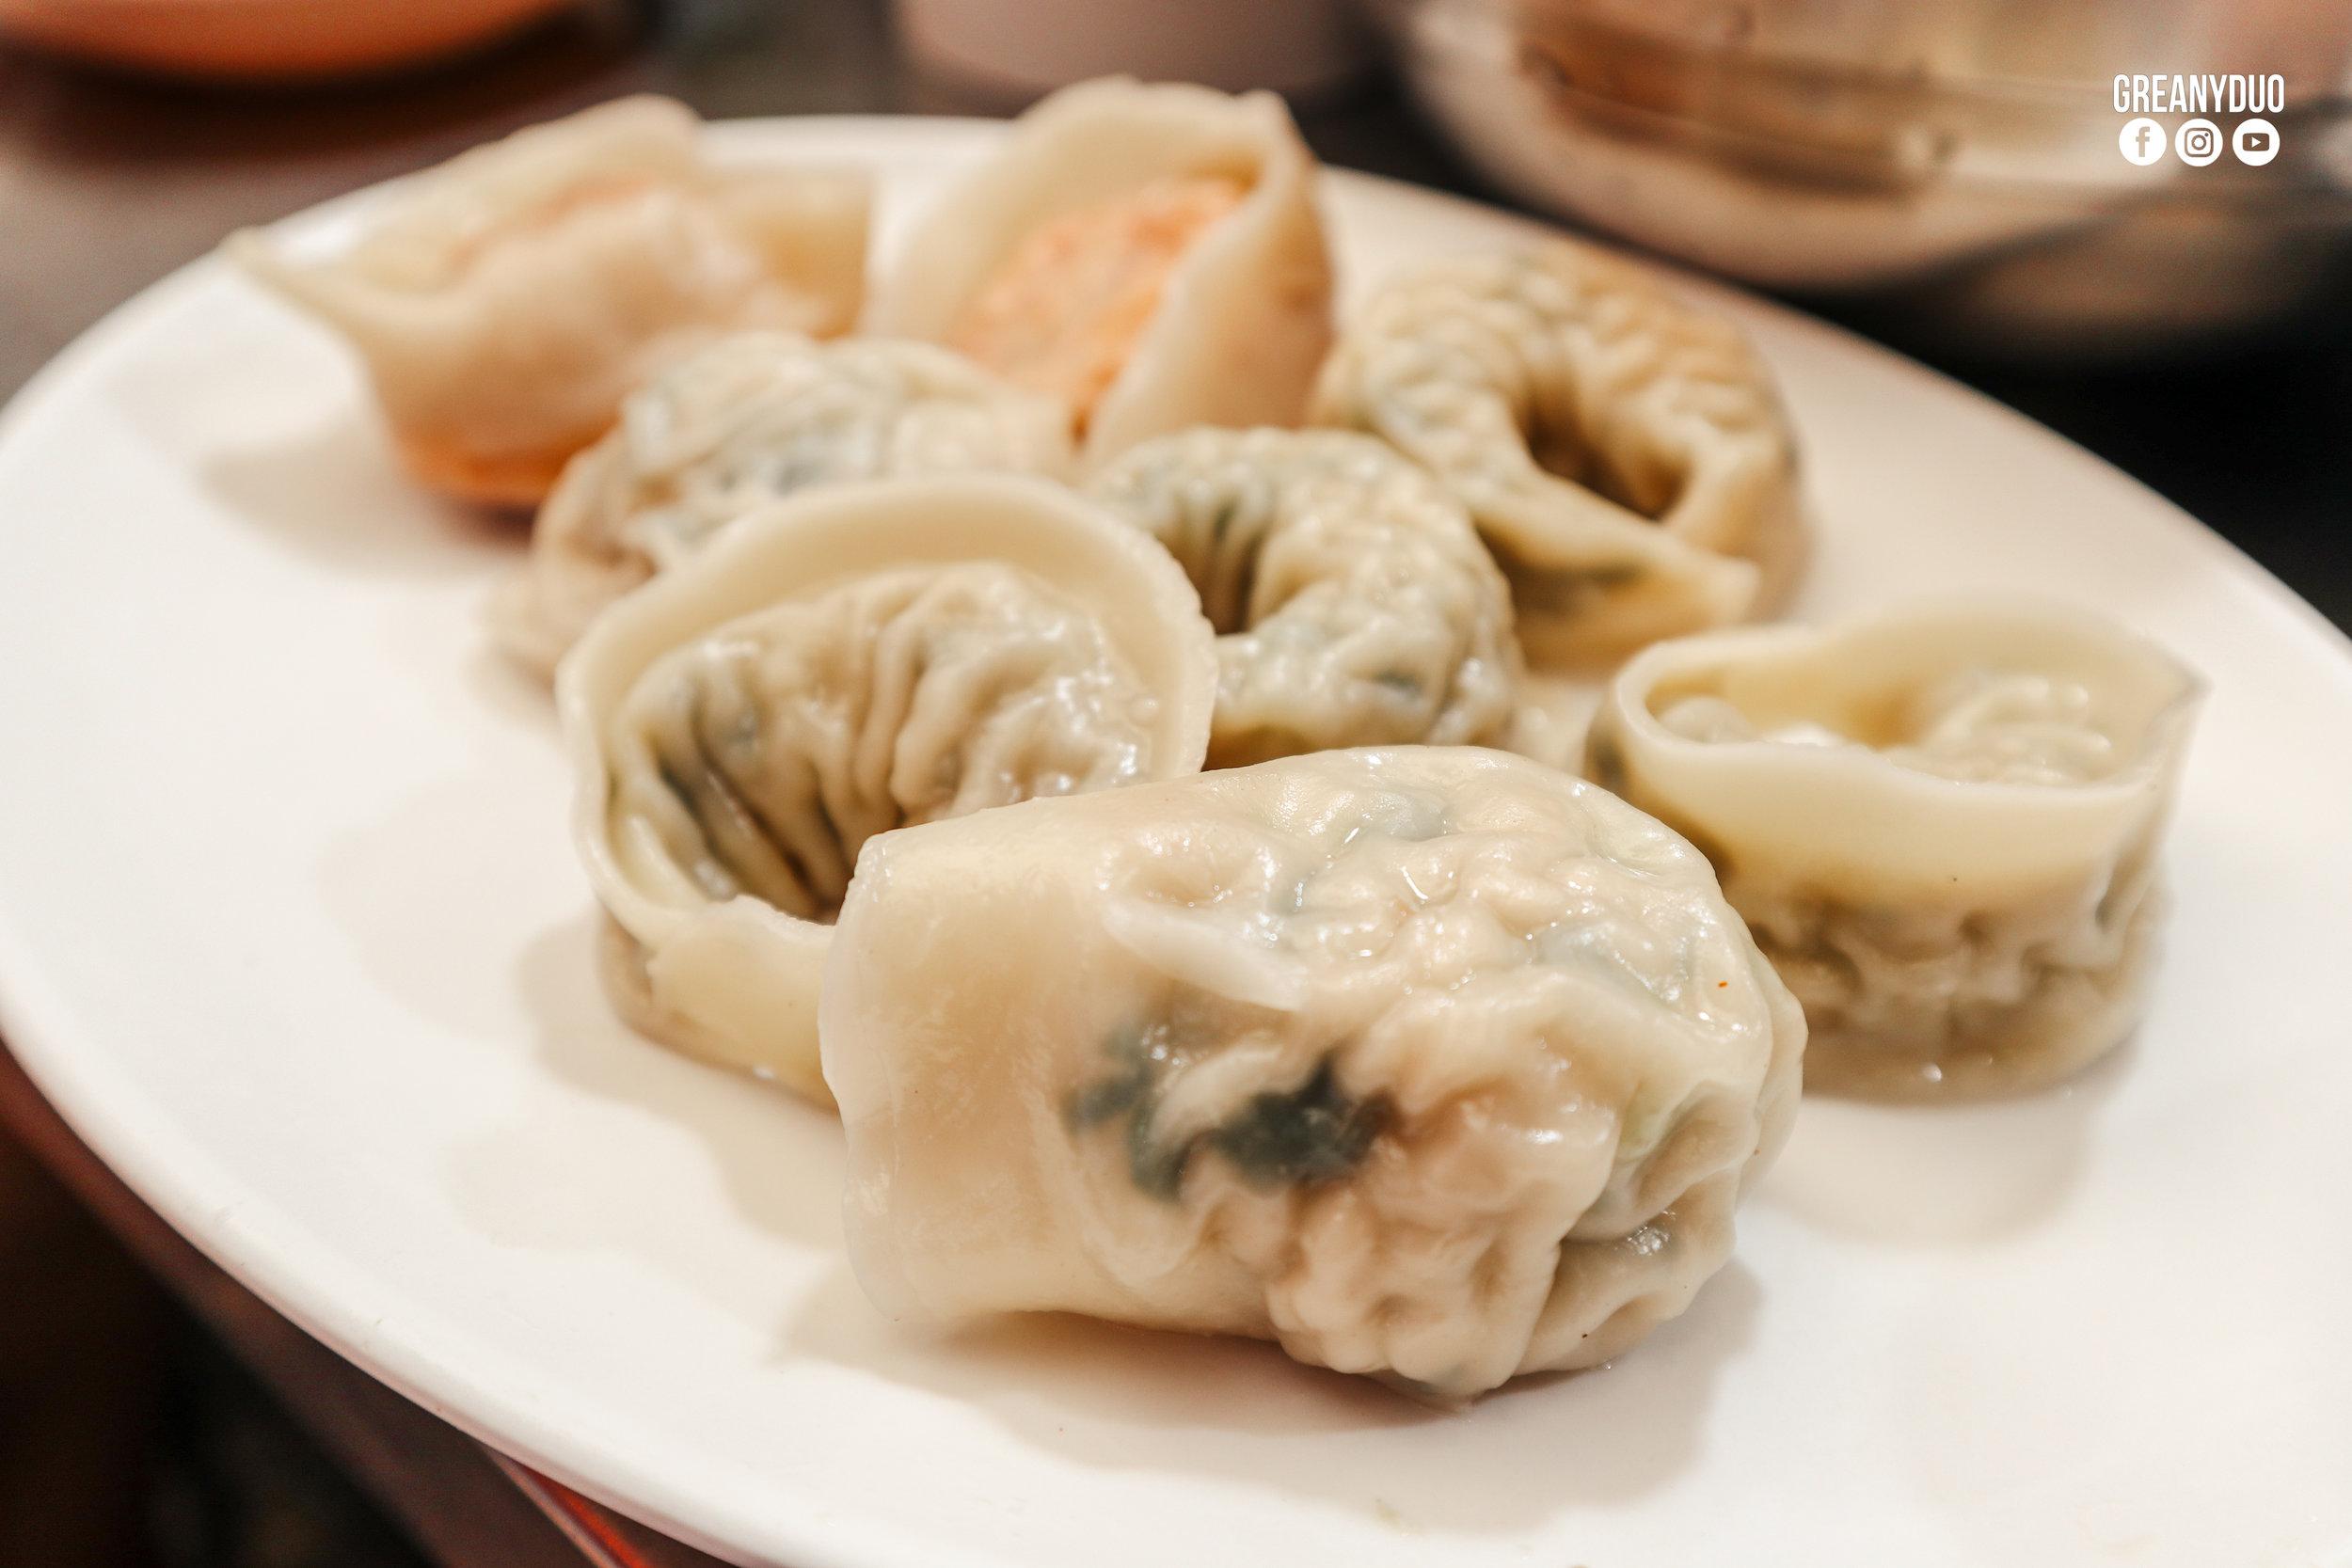 004Seoul_Food_WM.jpg